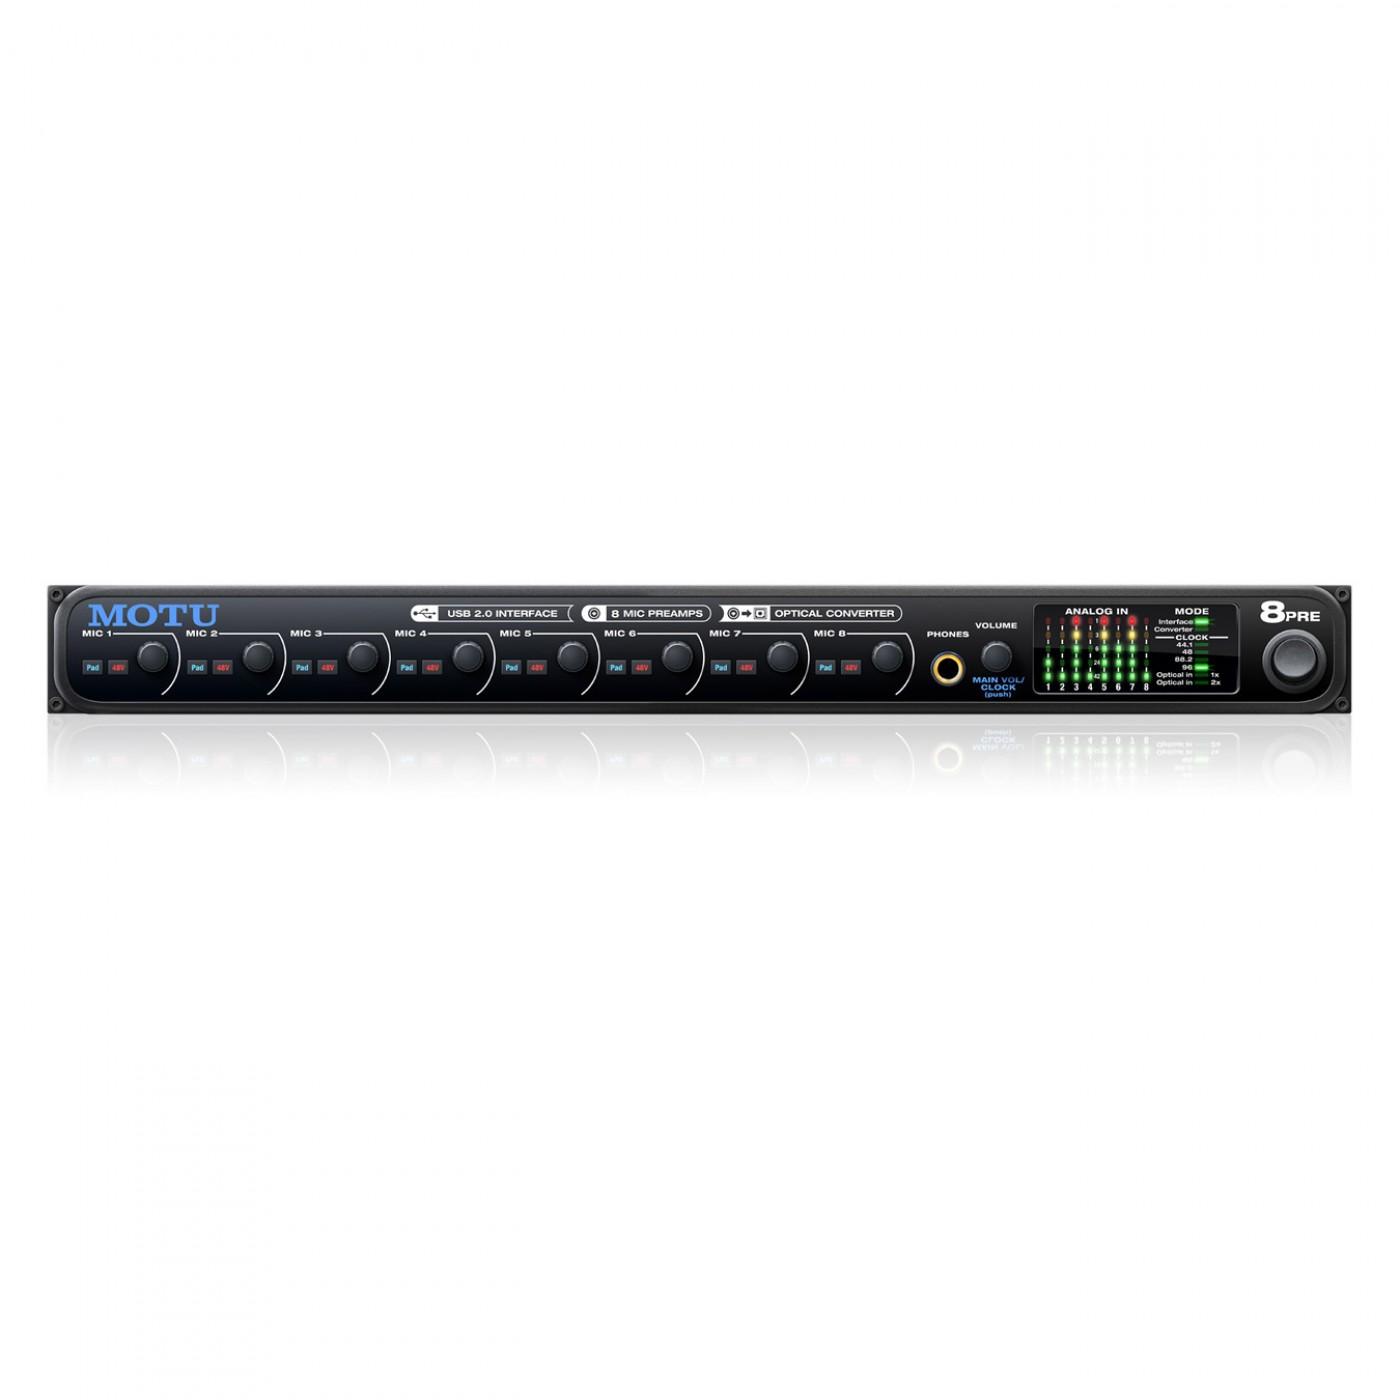 Motu 8Pre USB | Rage Audio